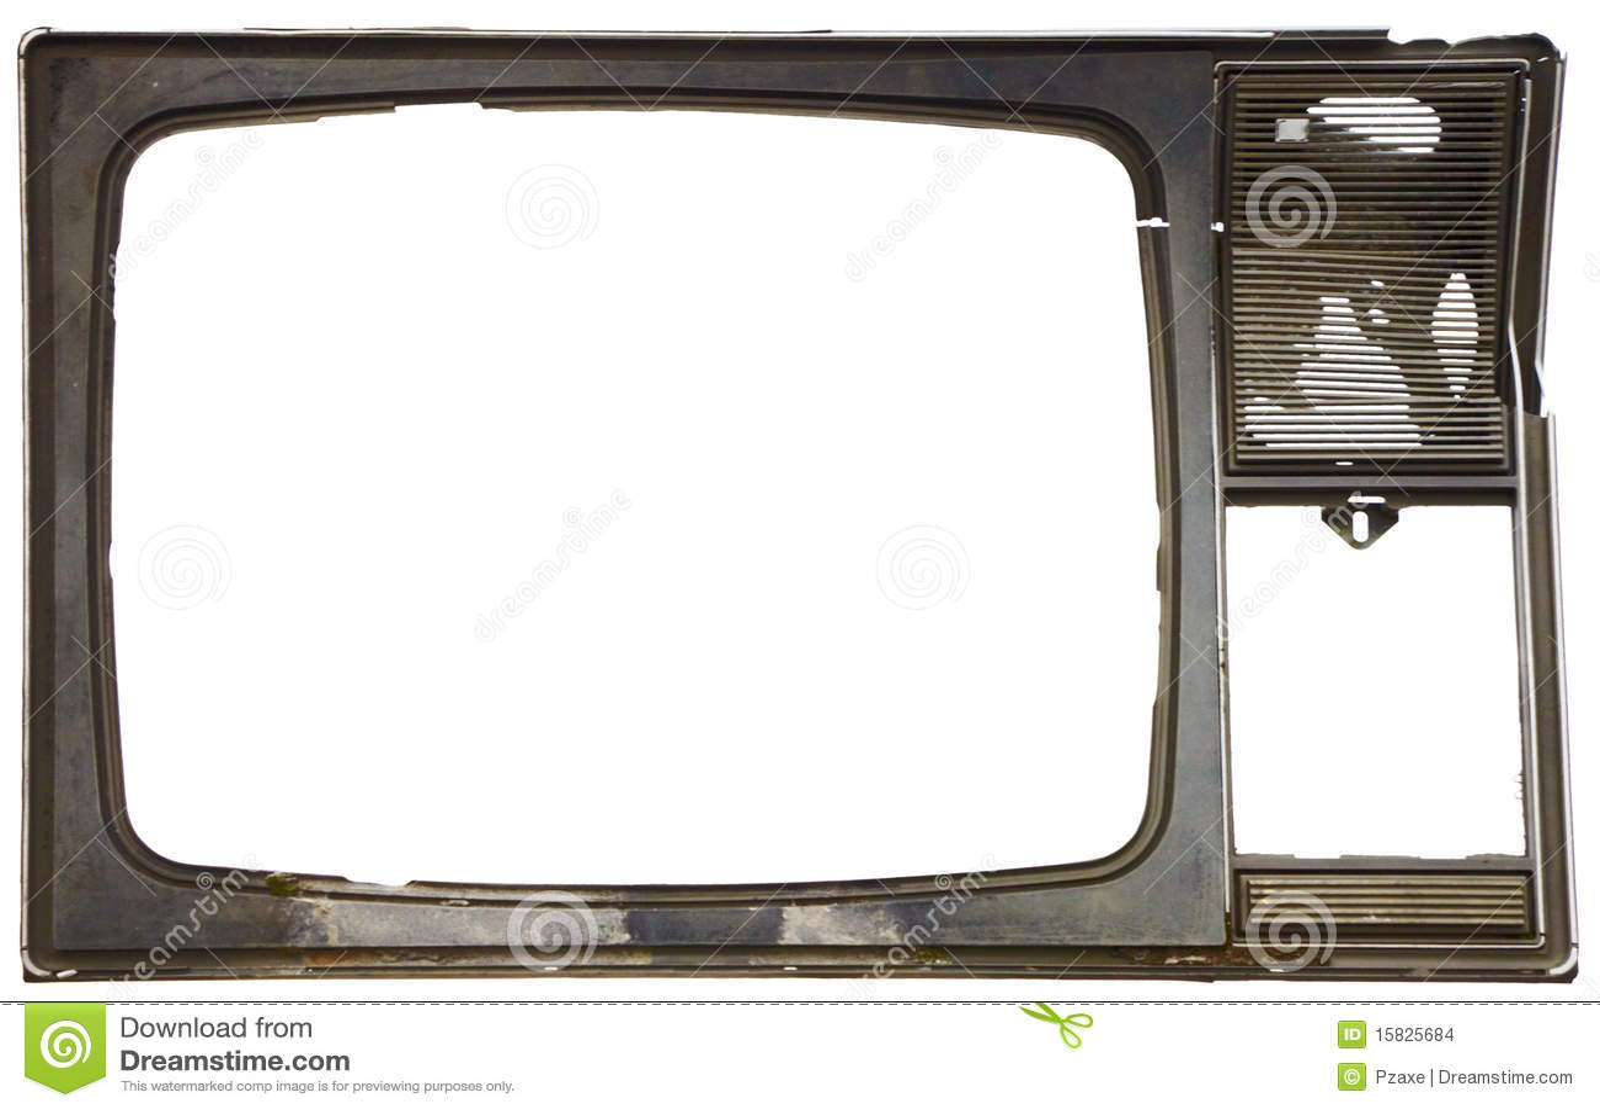 Old Dirty Frame Of Broken Tv Stock Images Image 15825684